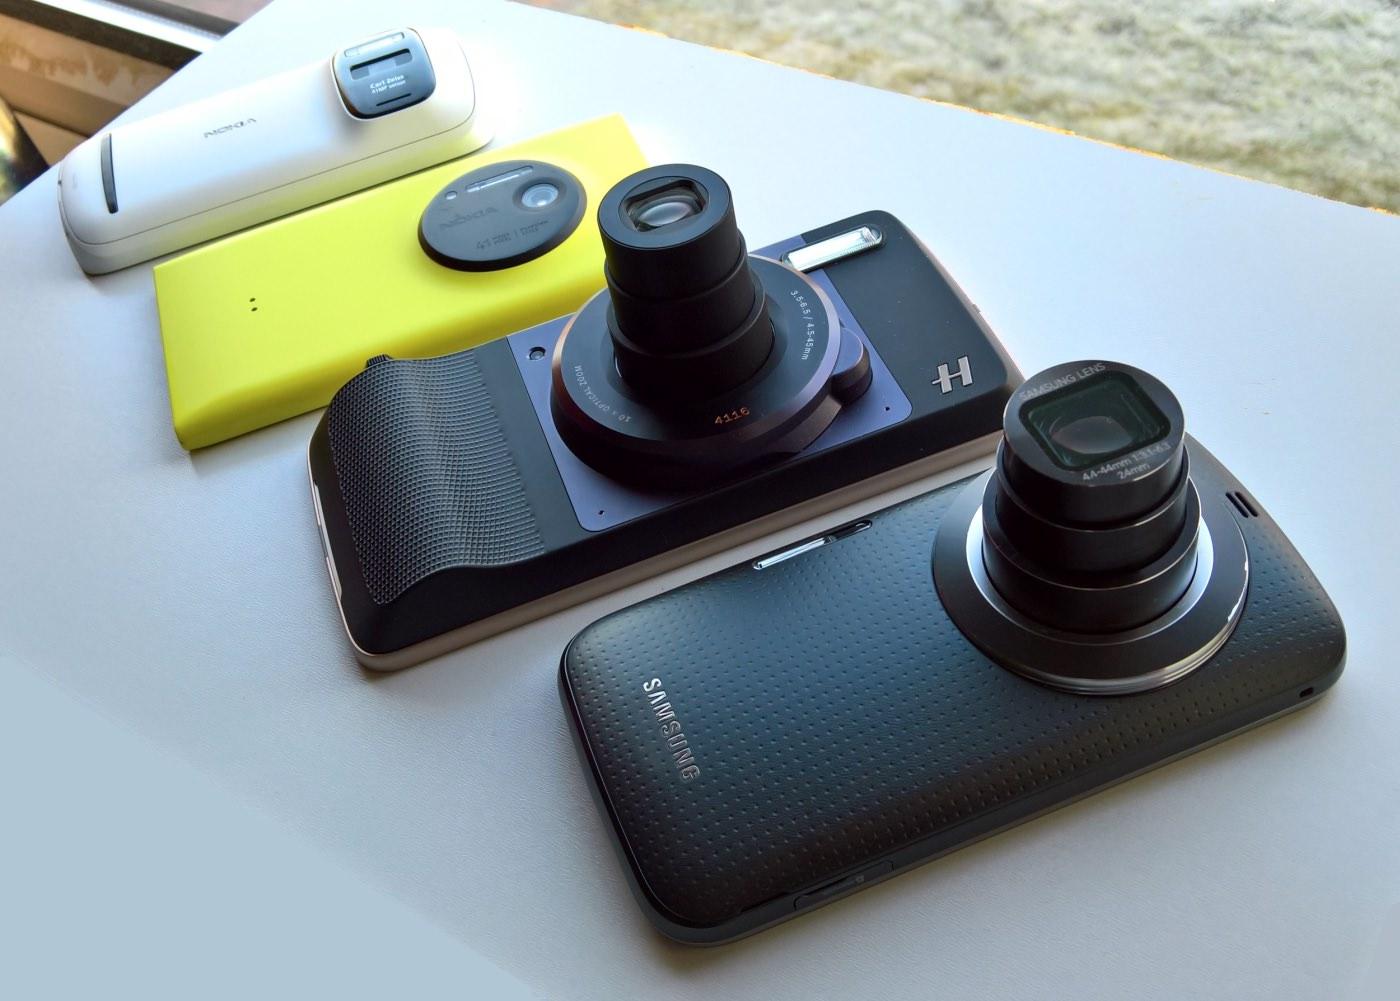 Camera phones compared, Hasselblad mod